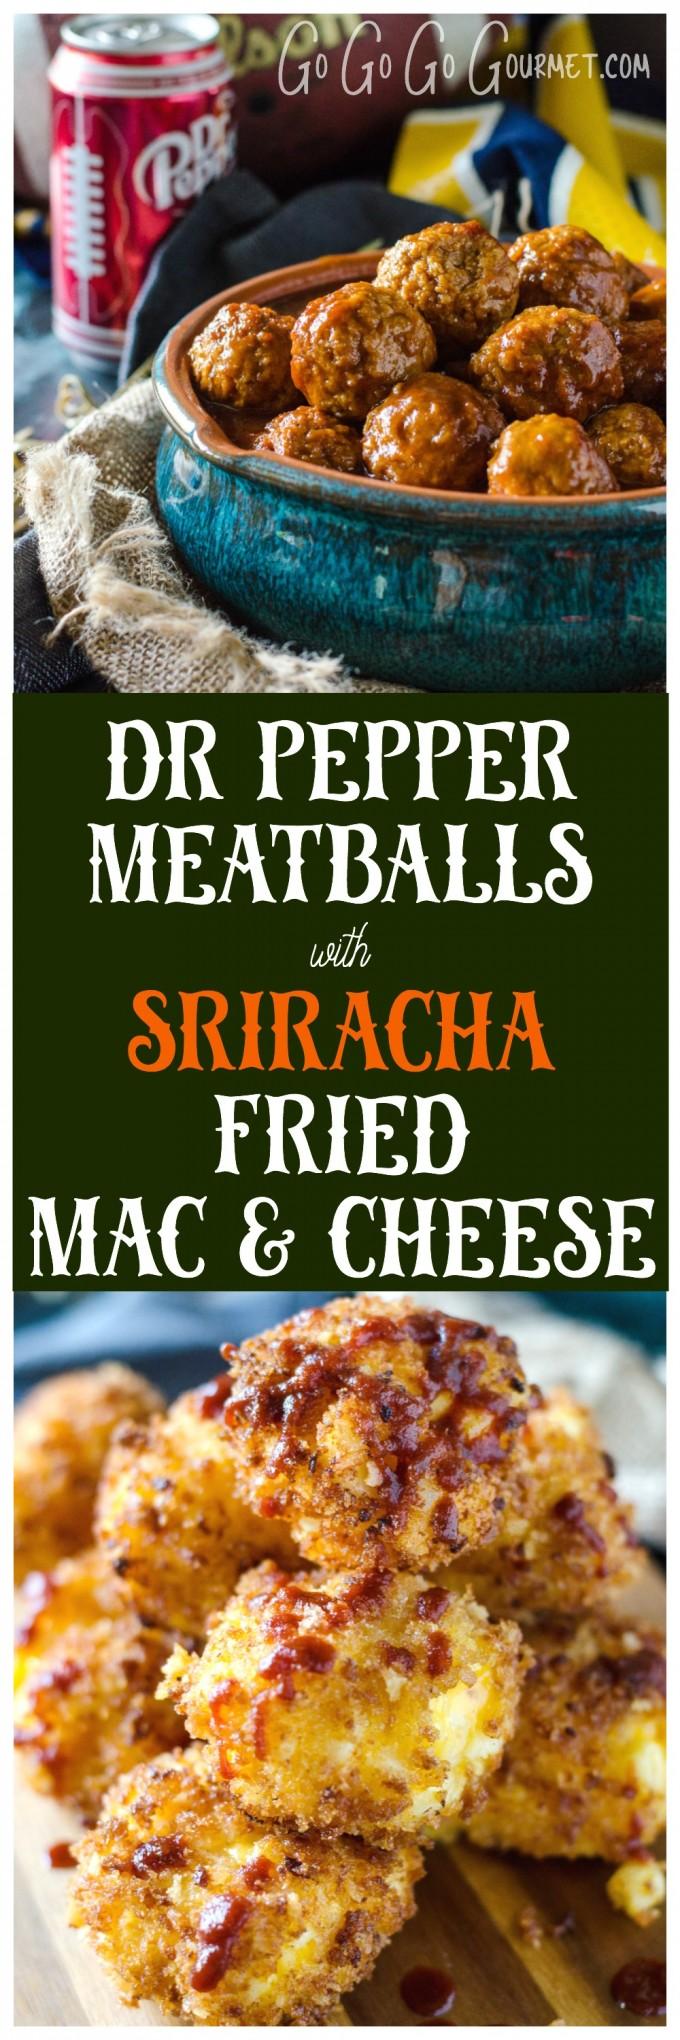 Dr Pepper Crockpot Meatballs with Sriracha Fried Mac & Cheese Bites